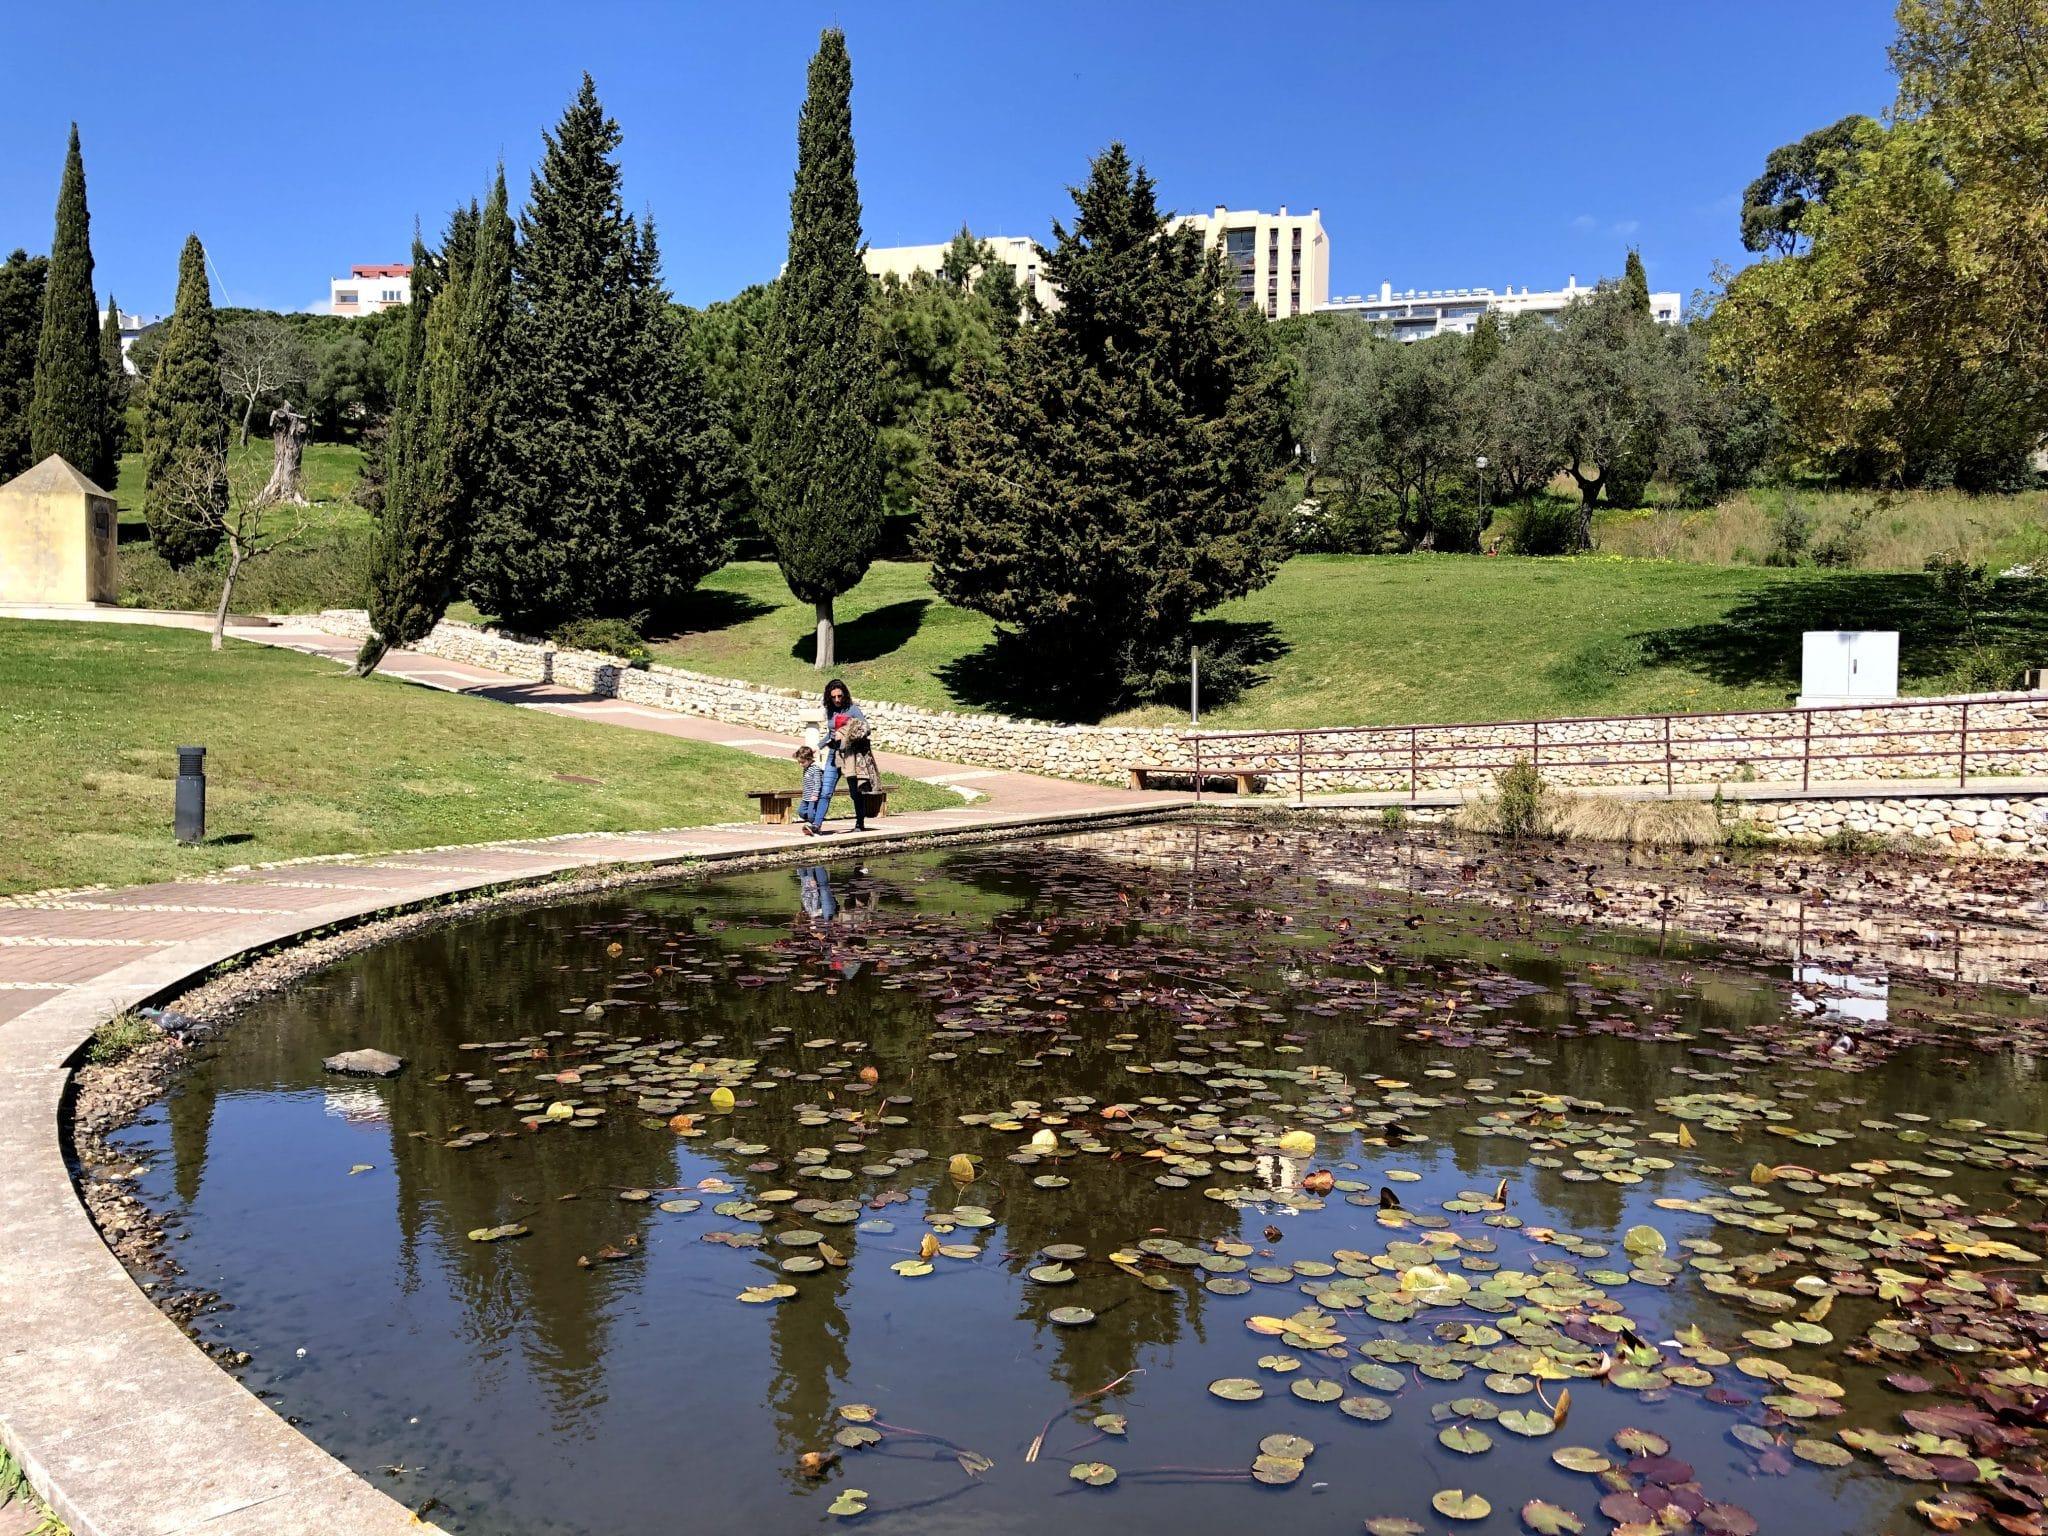 lago Parque Recreativo dos Moinhos de Santana